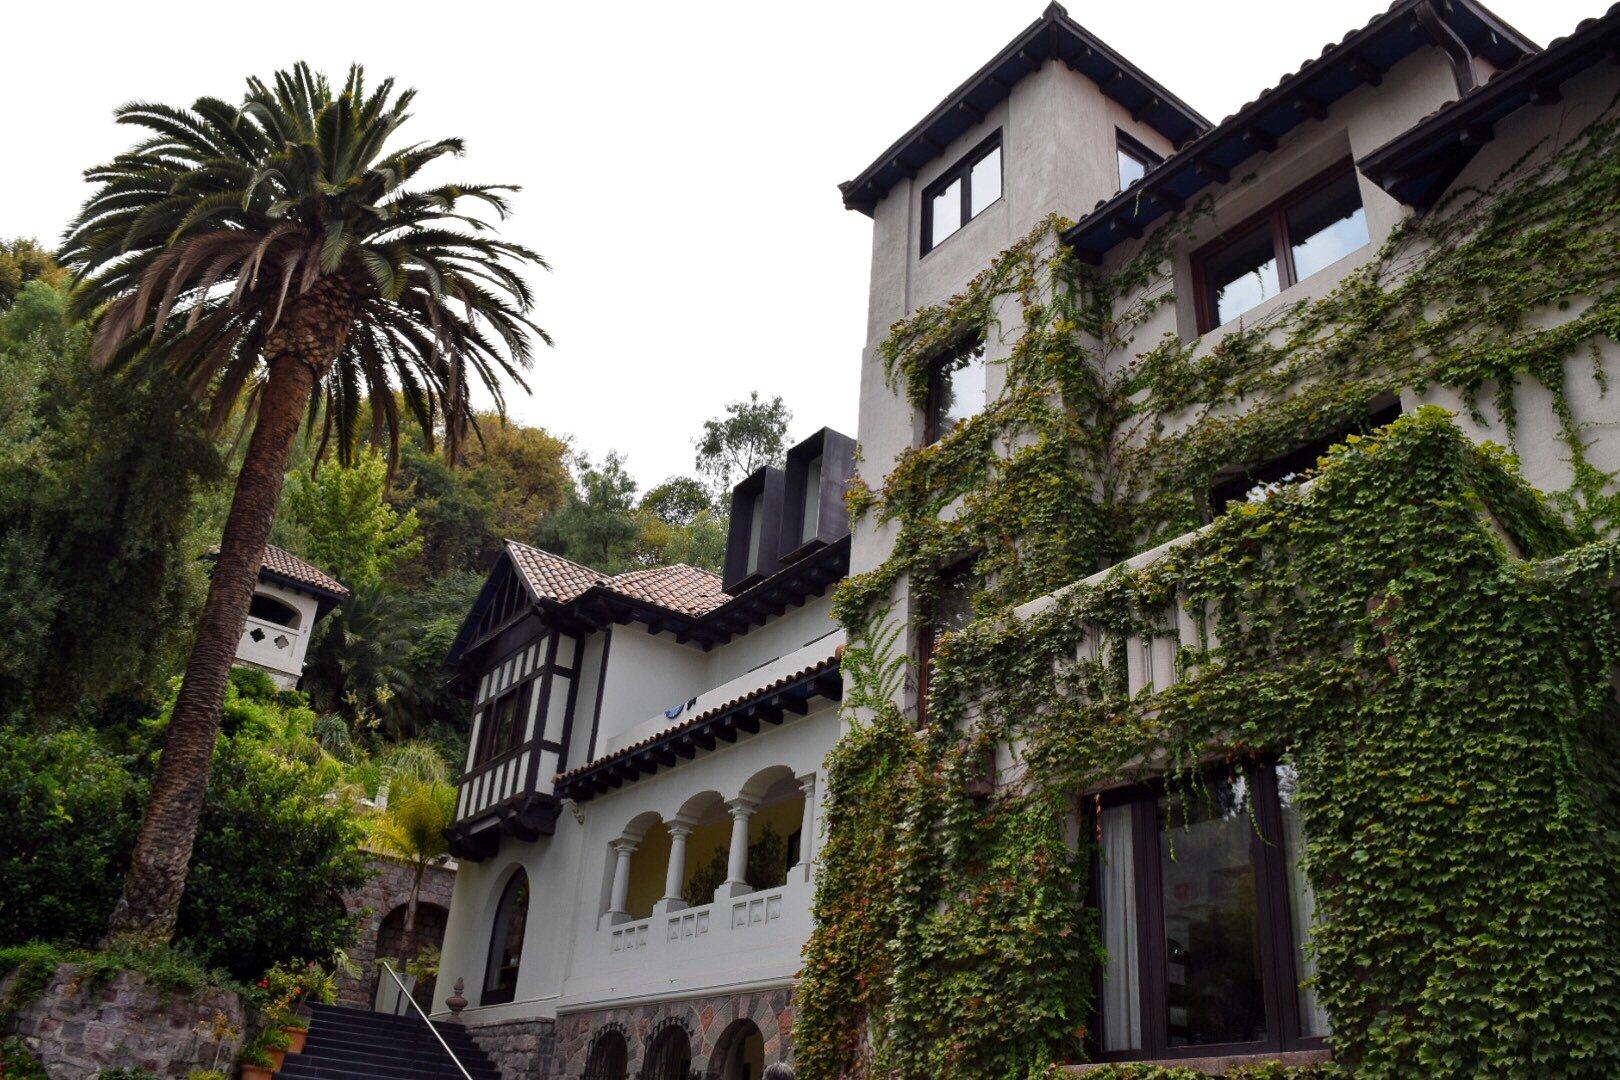 The Aubrey Hotel in Santiago, Chile